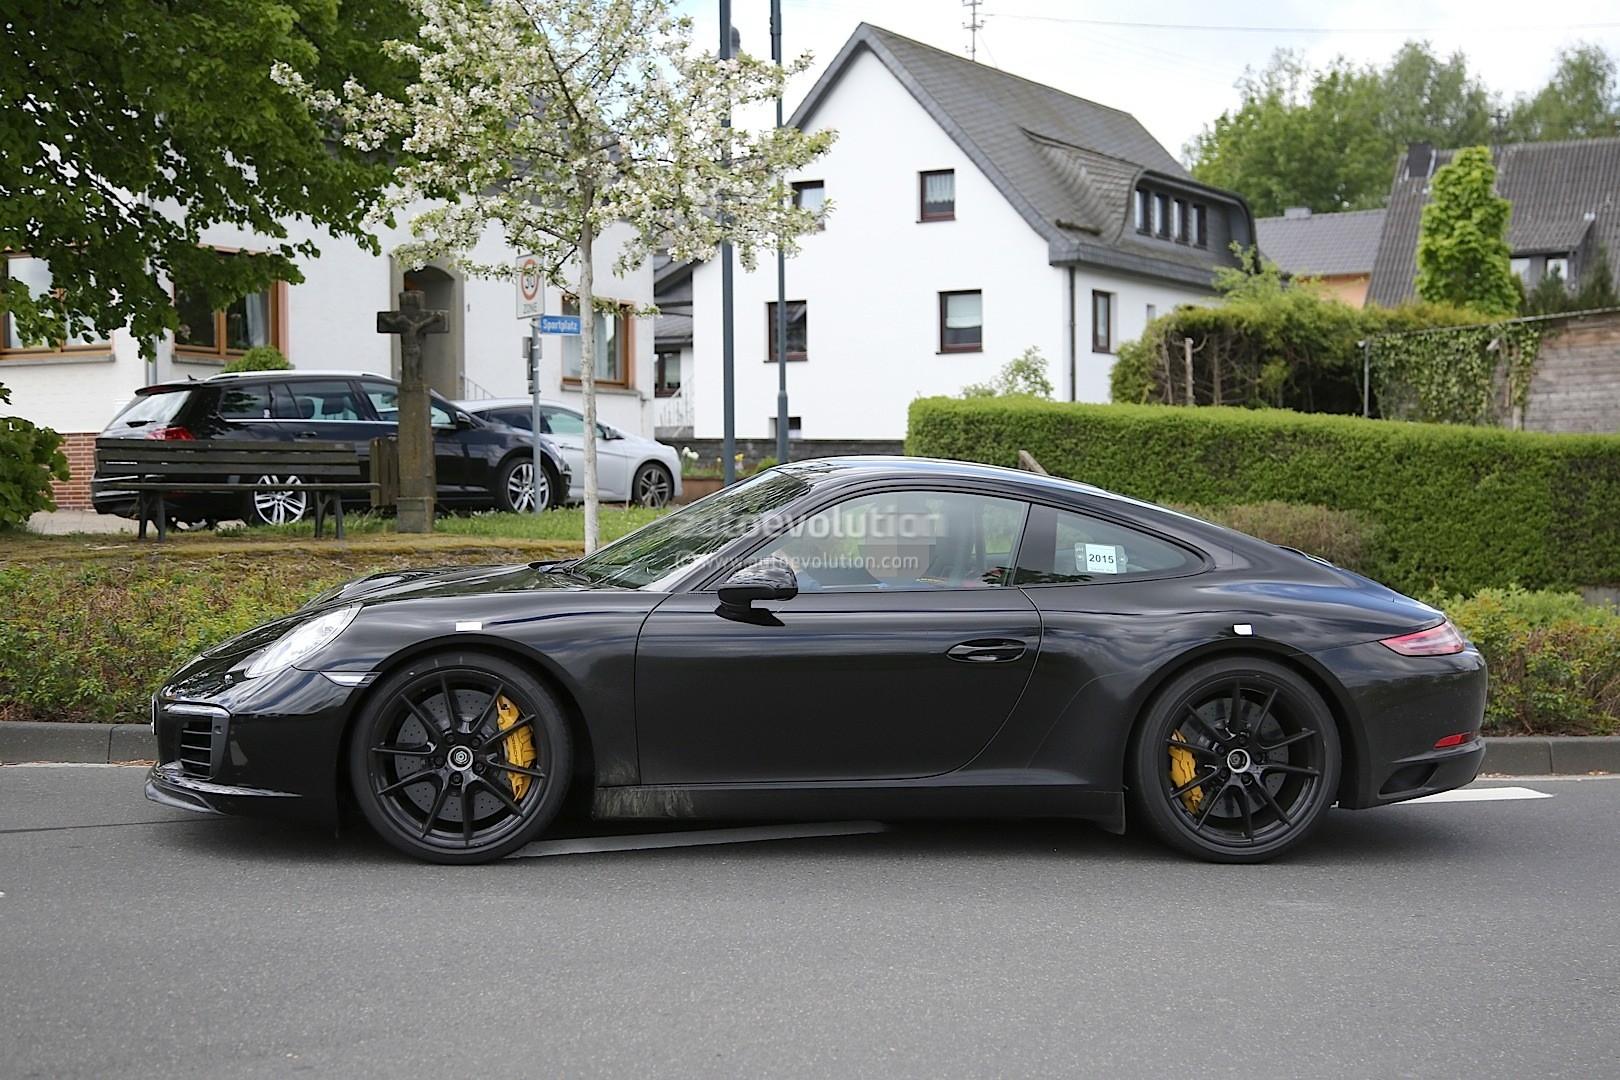 2016 Porsche 911 Revealed In Latest Spyshots Facelift